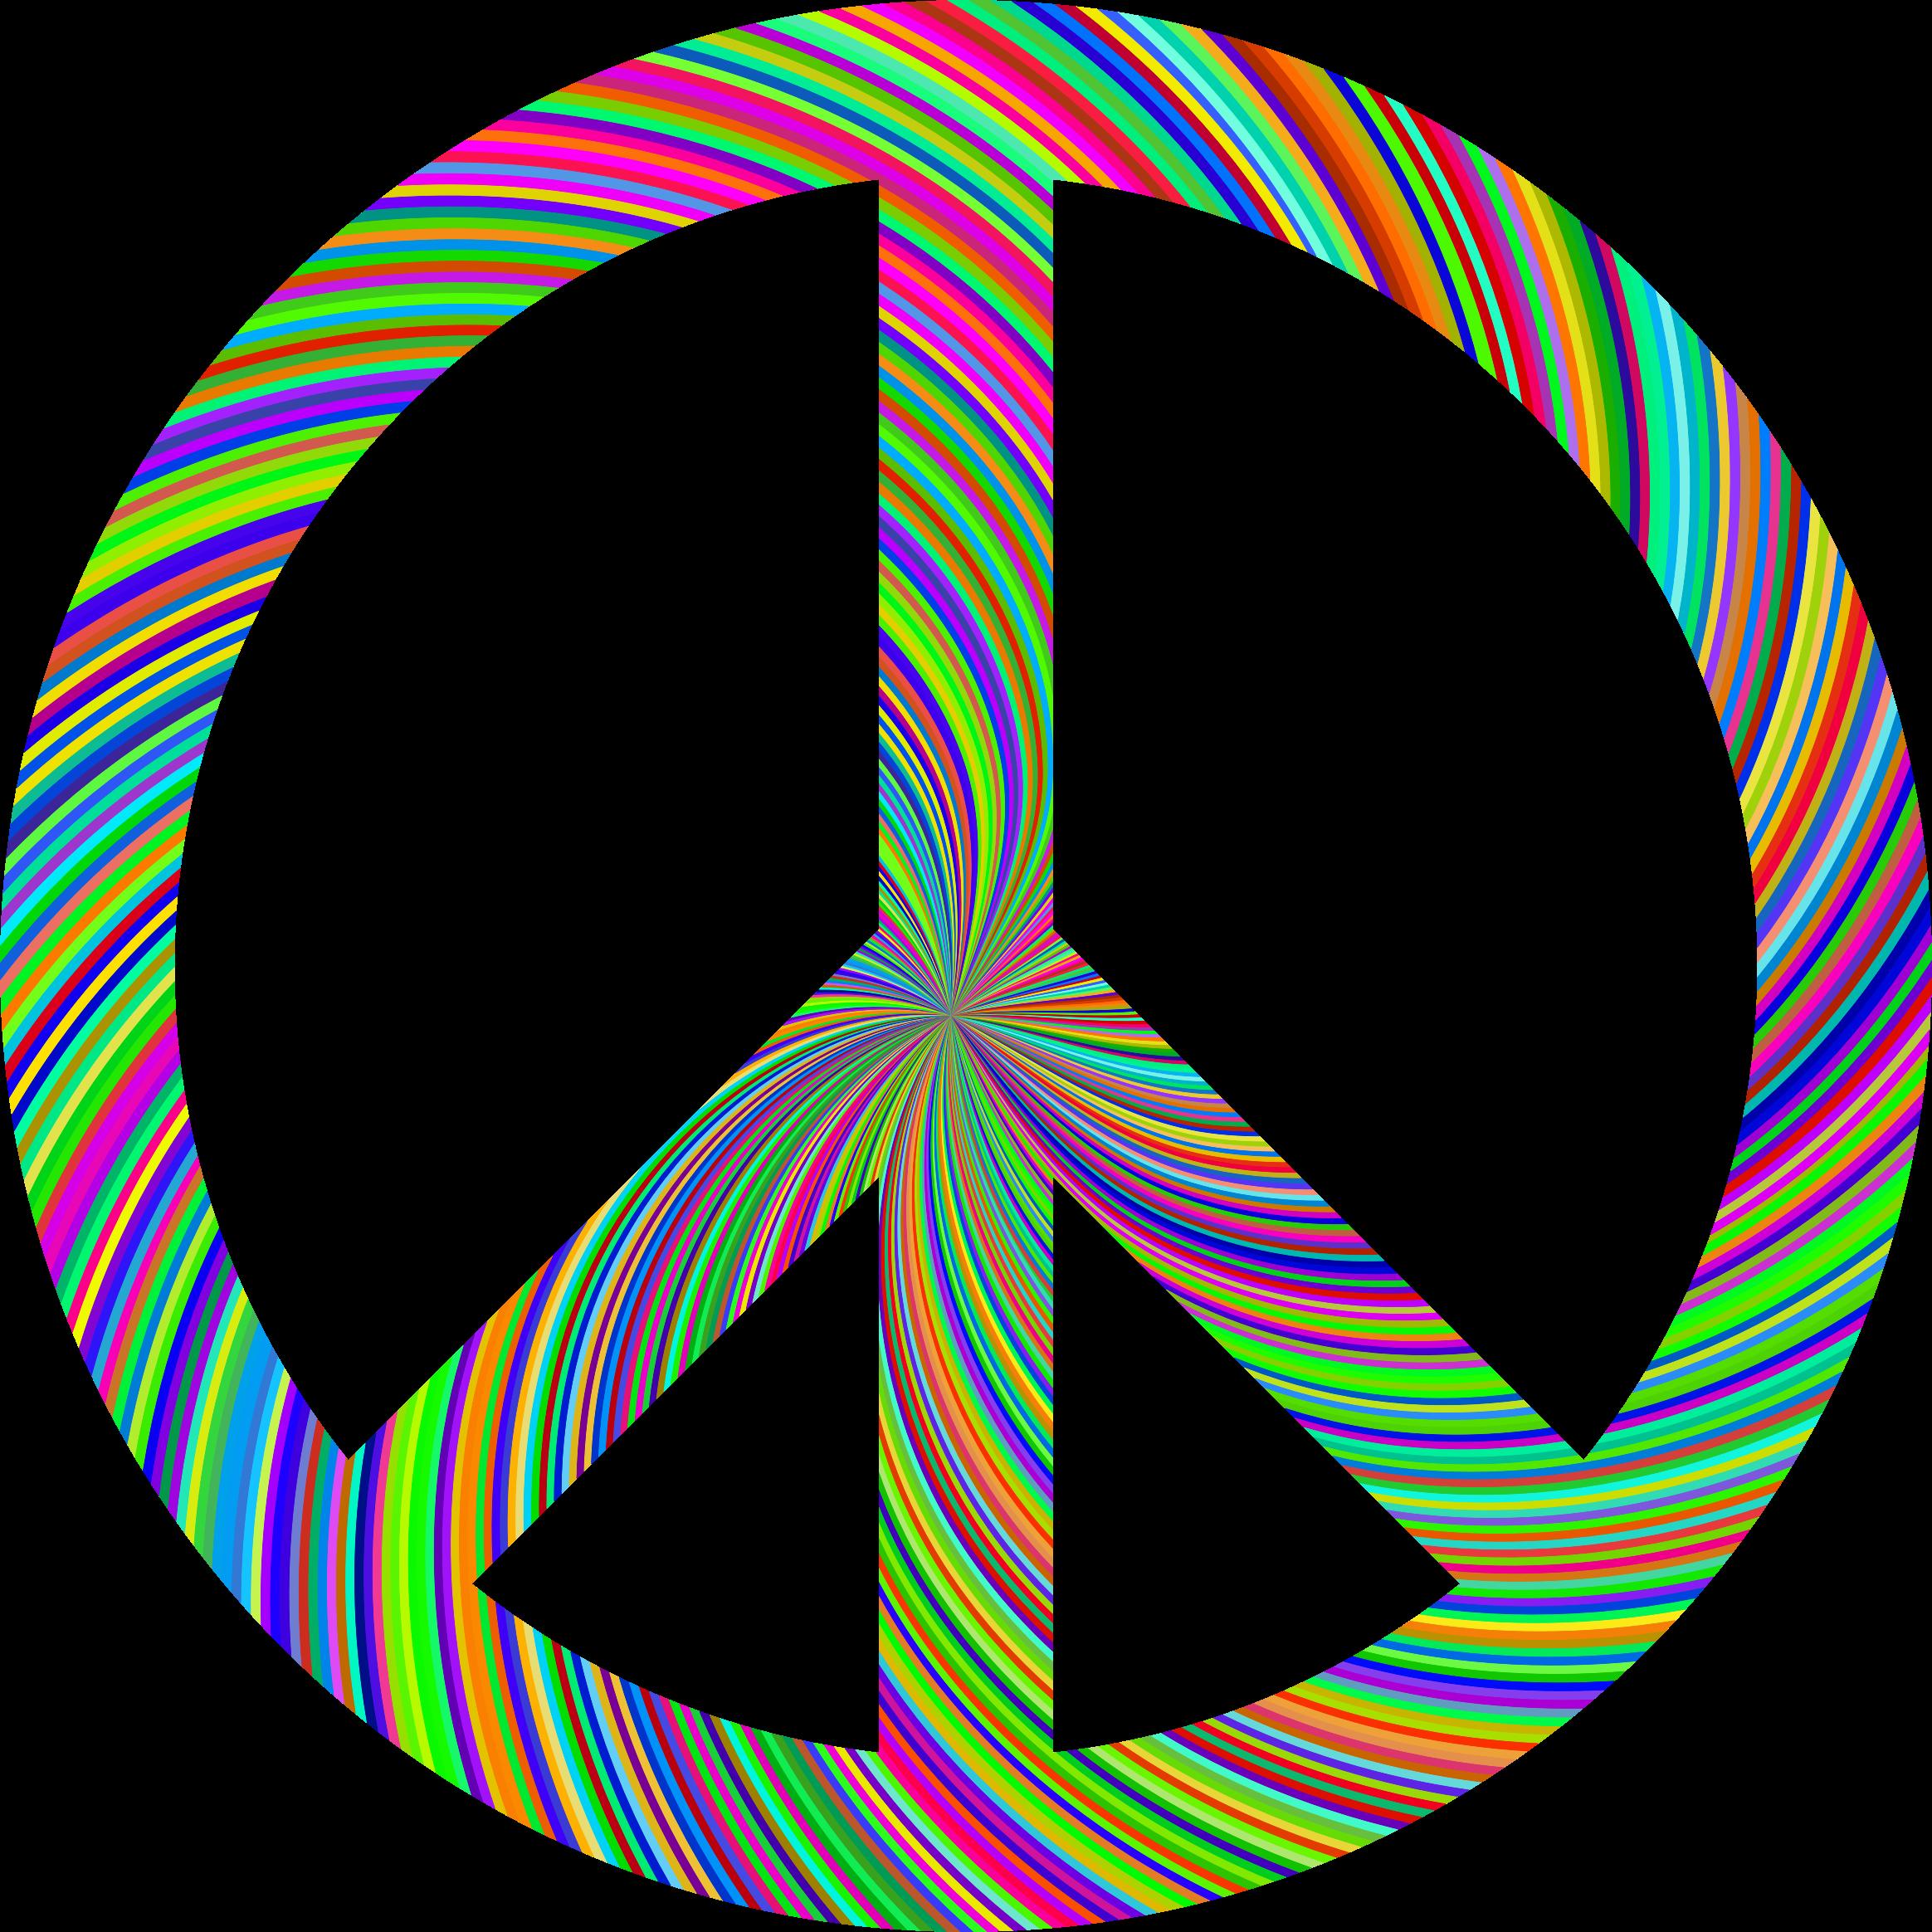 Pin de ✌✿☮ K e l l y ♥☼♬ en Peace II | Pinterest